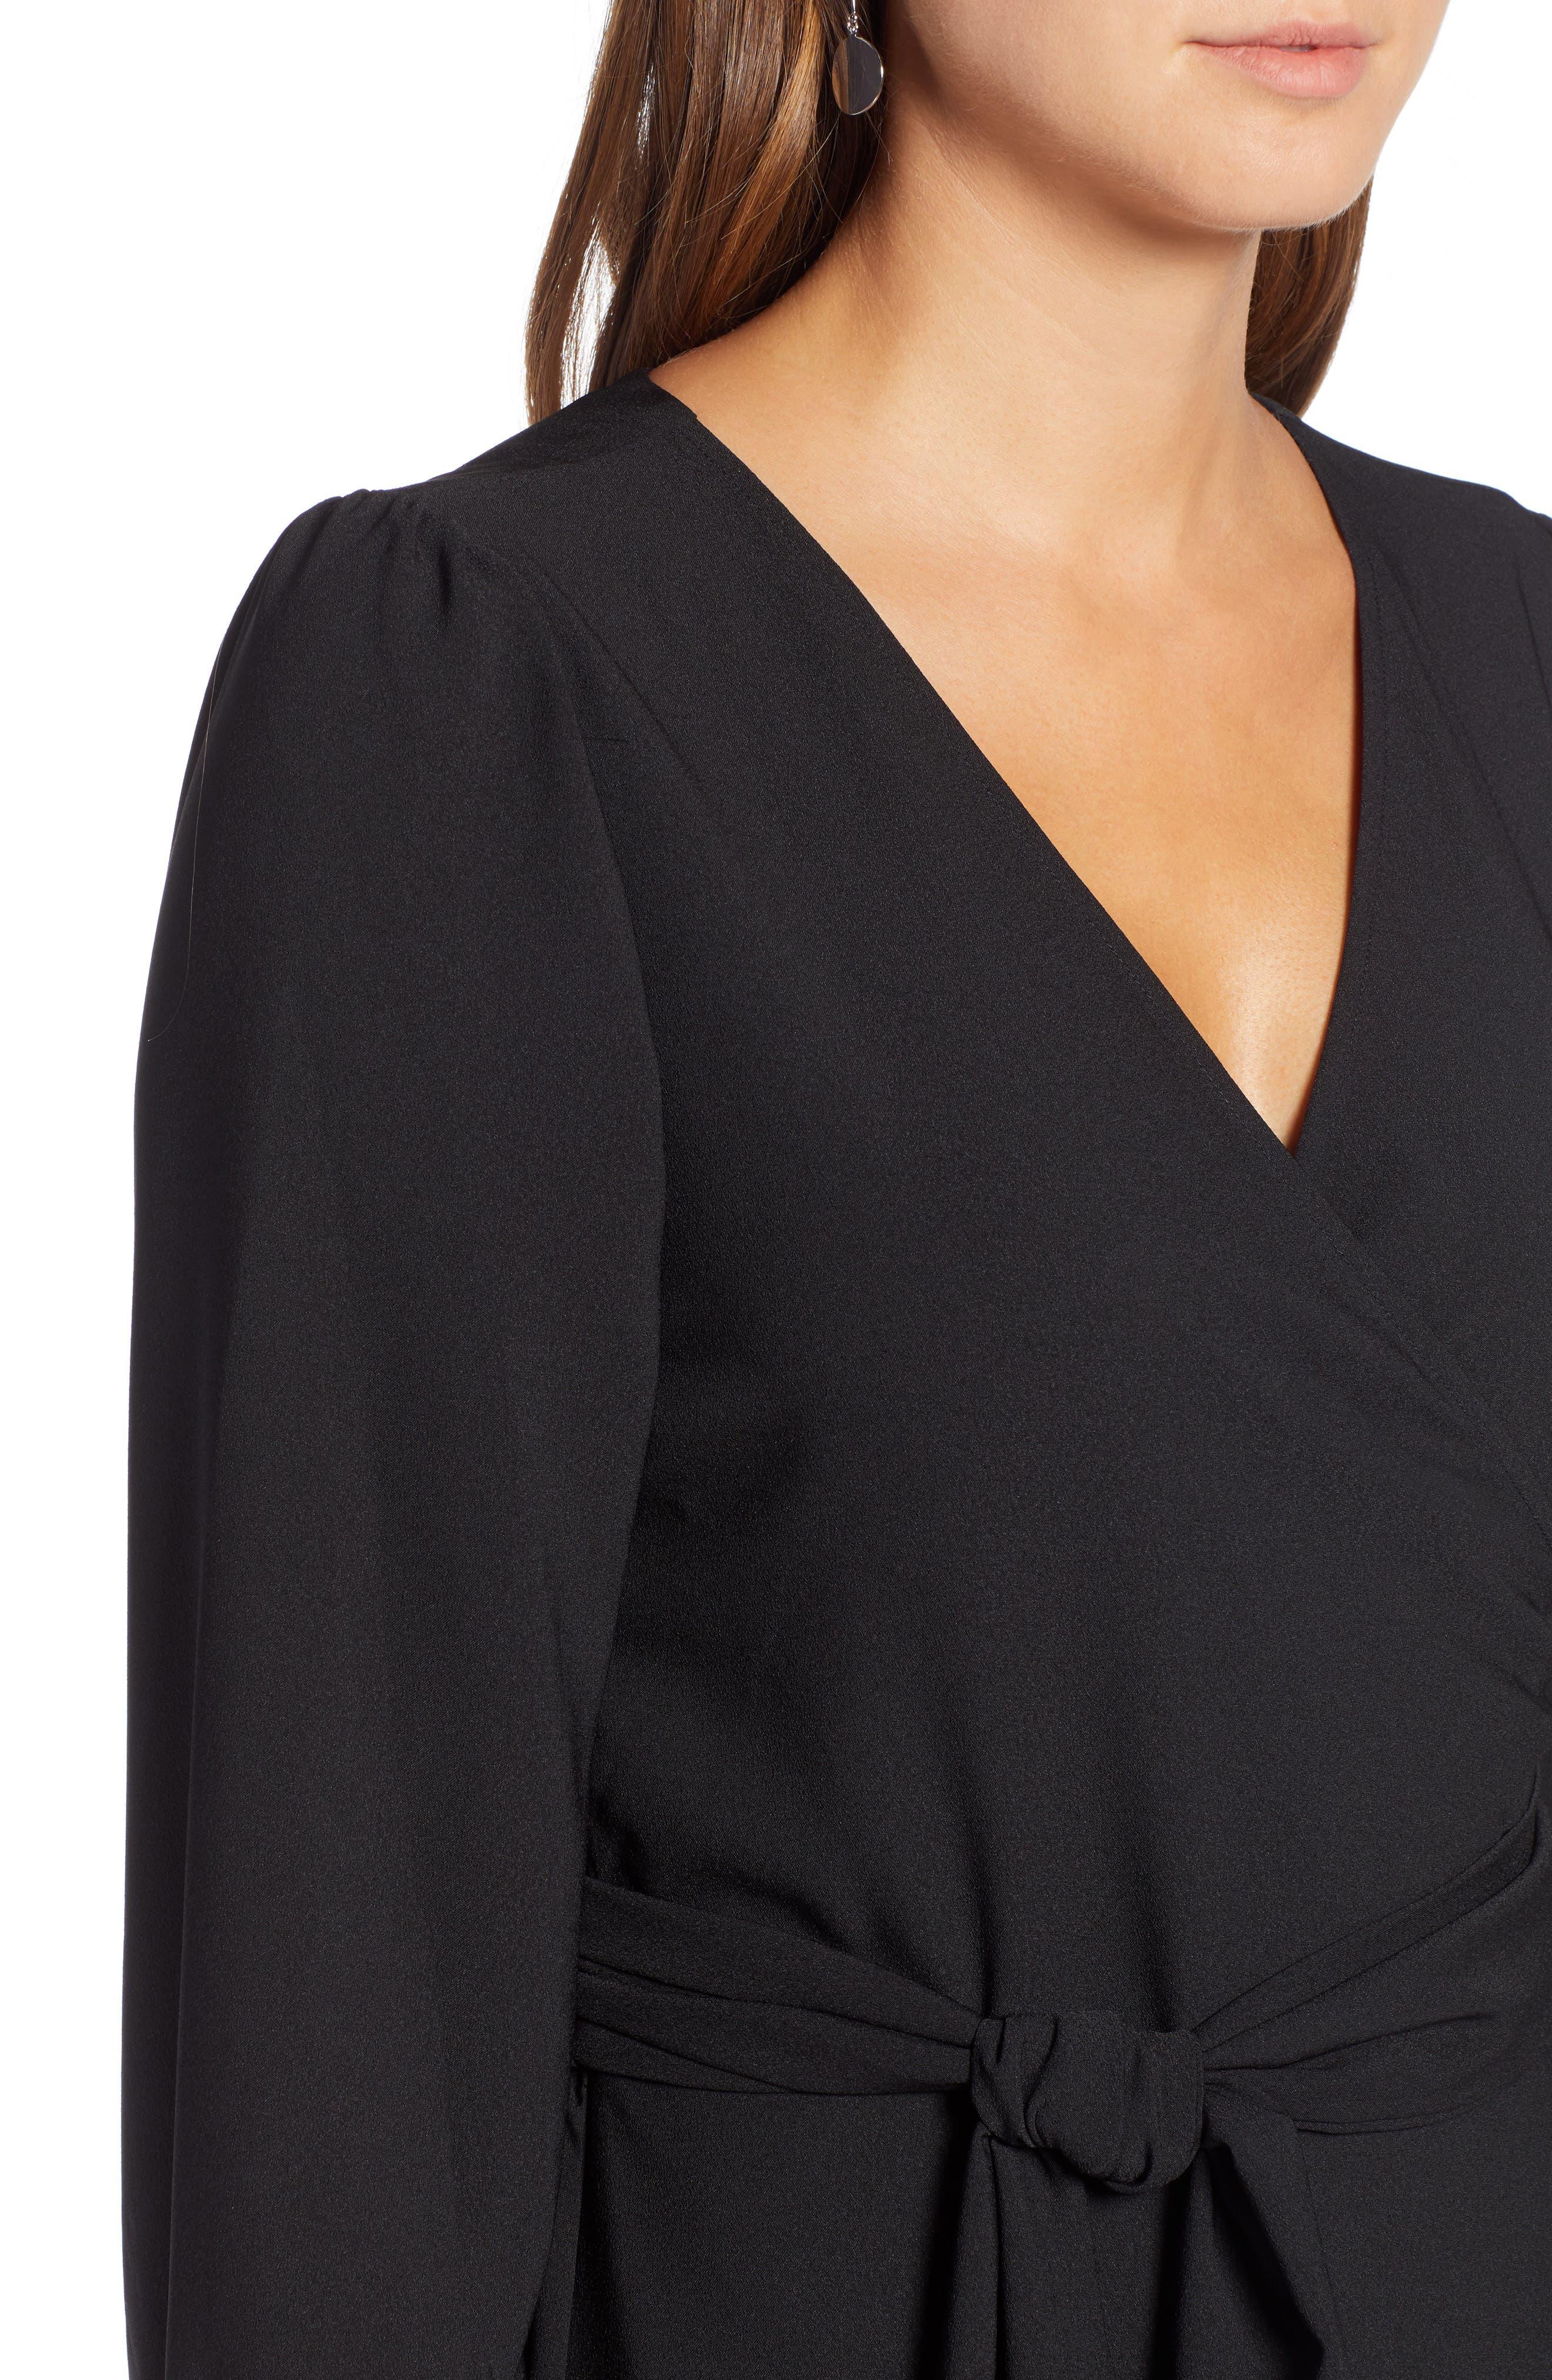 Wrap Dress,                             Alternate thumbnail 4, color,                             BLACK